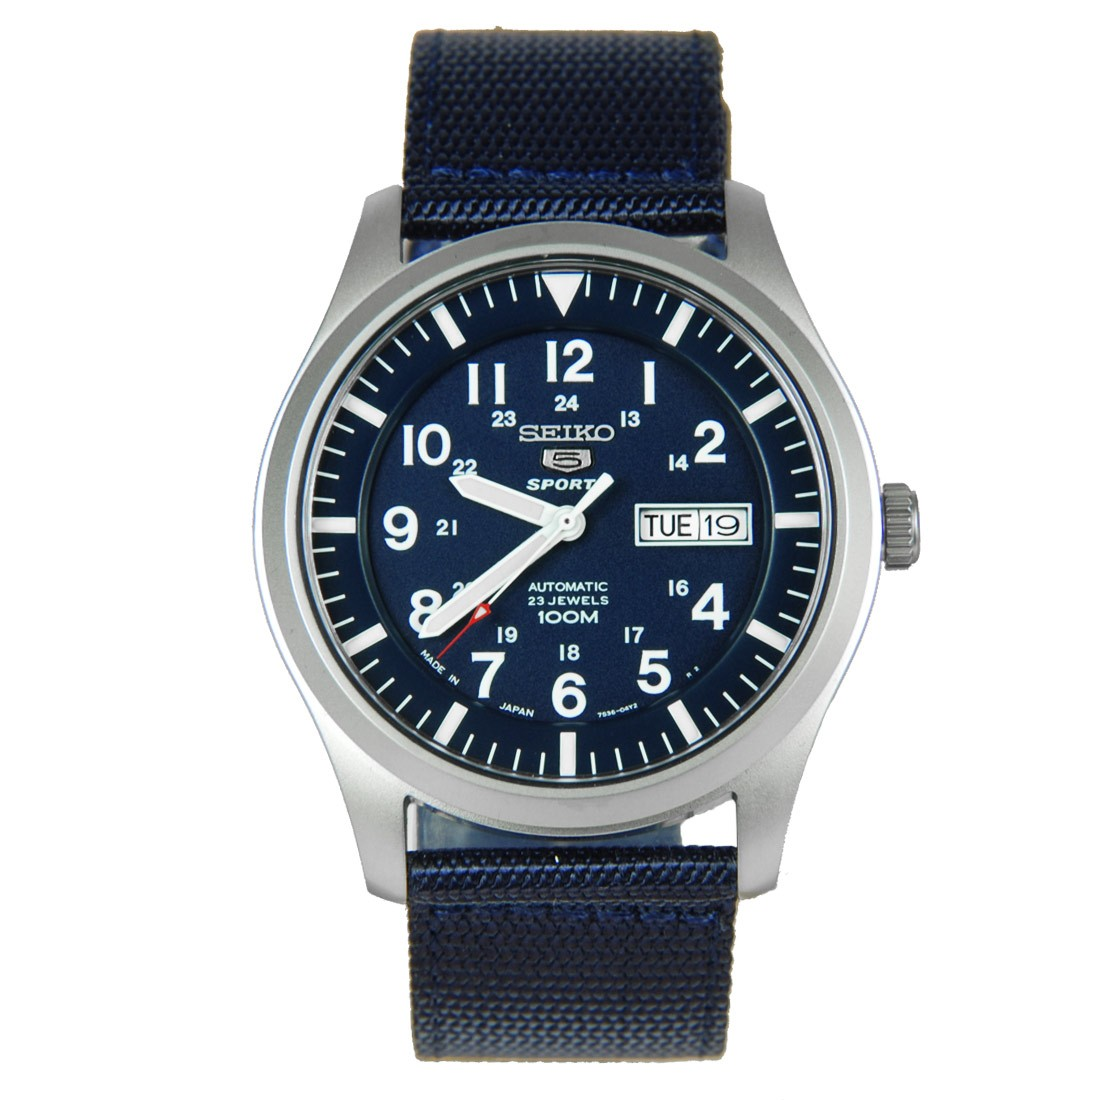 đồng hồ Seiko SNZG11J1 (1)